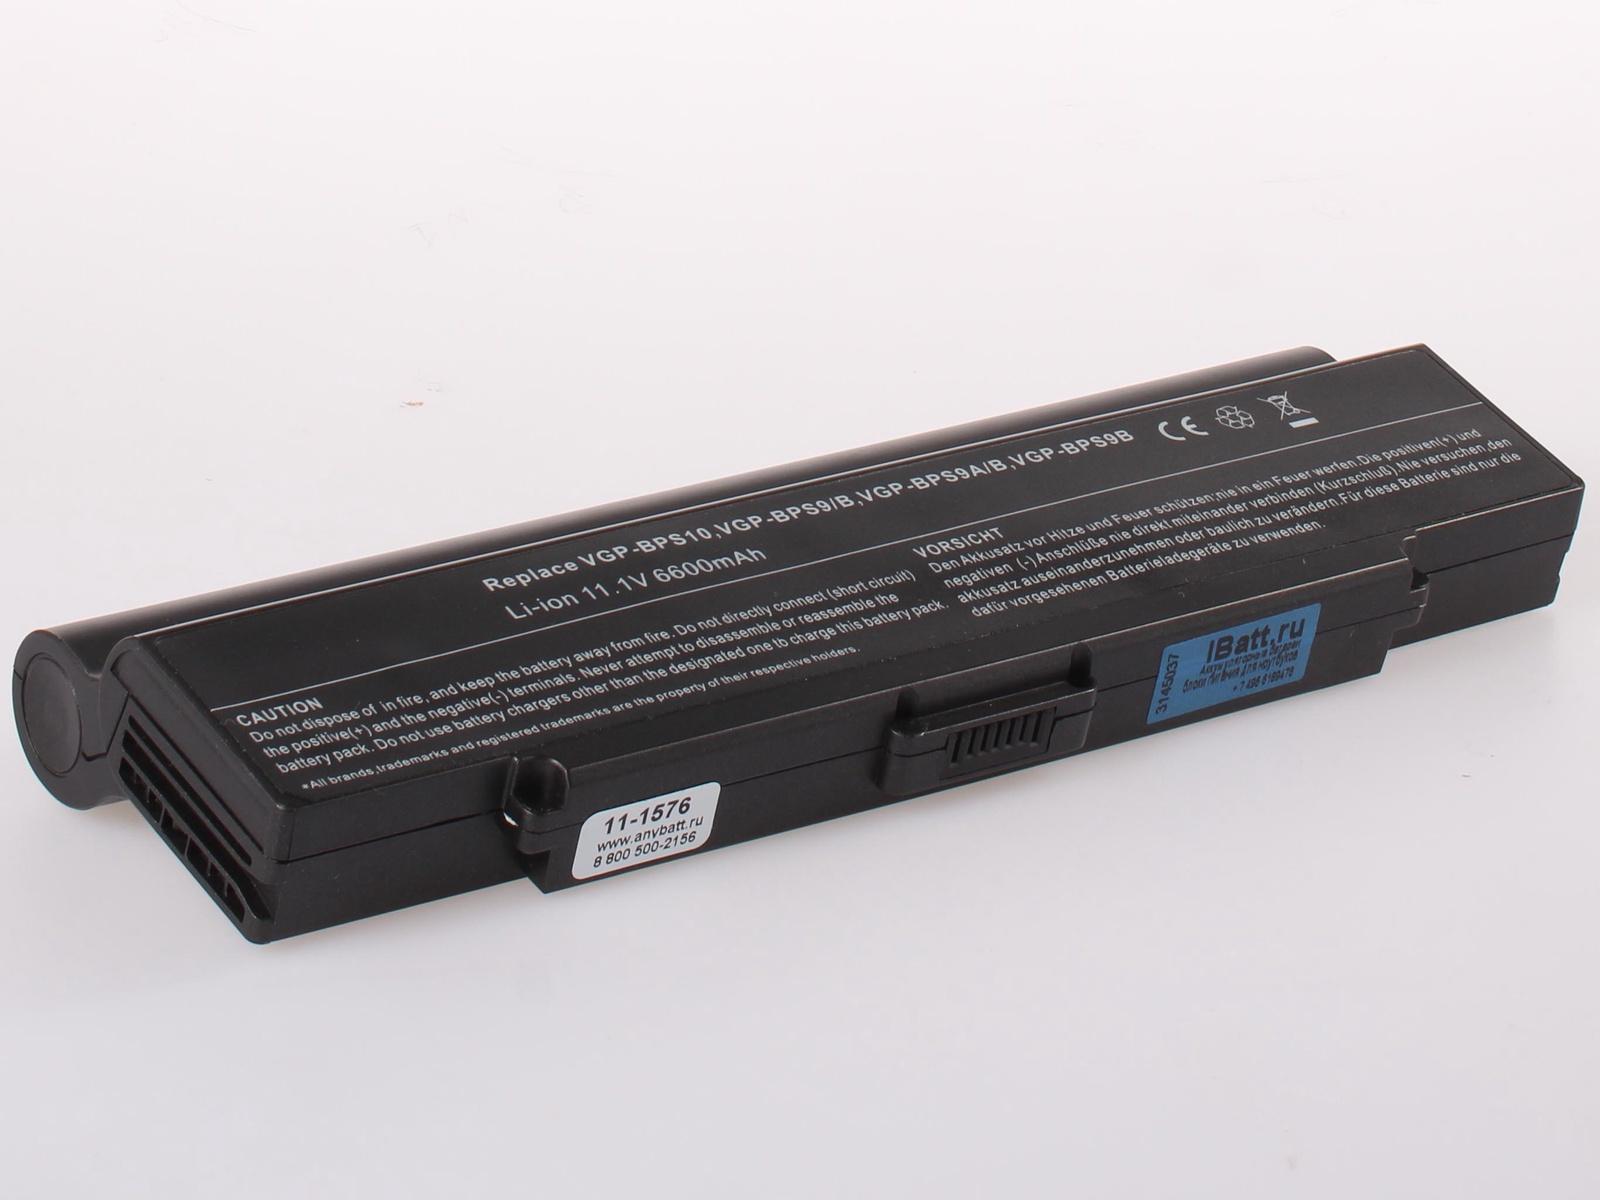 Аккумулятор для ноутбука AnyBatt для Sony VAIO VGN-NR31ZR, VAIO VGN-NR31ER, VAIO VGN-NR21SR, VAIO PCG-7115P, VAIO VGN-NR11SR, VAIO VGN-SZ760, VAIO VGN-CR510E, VAIO VGN-NR385E, VAIO VGN-NR498E, VAIO VGN-NR110E, VAIO VGN-SZ645P